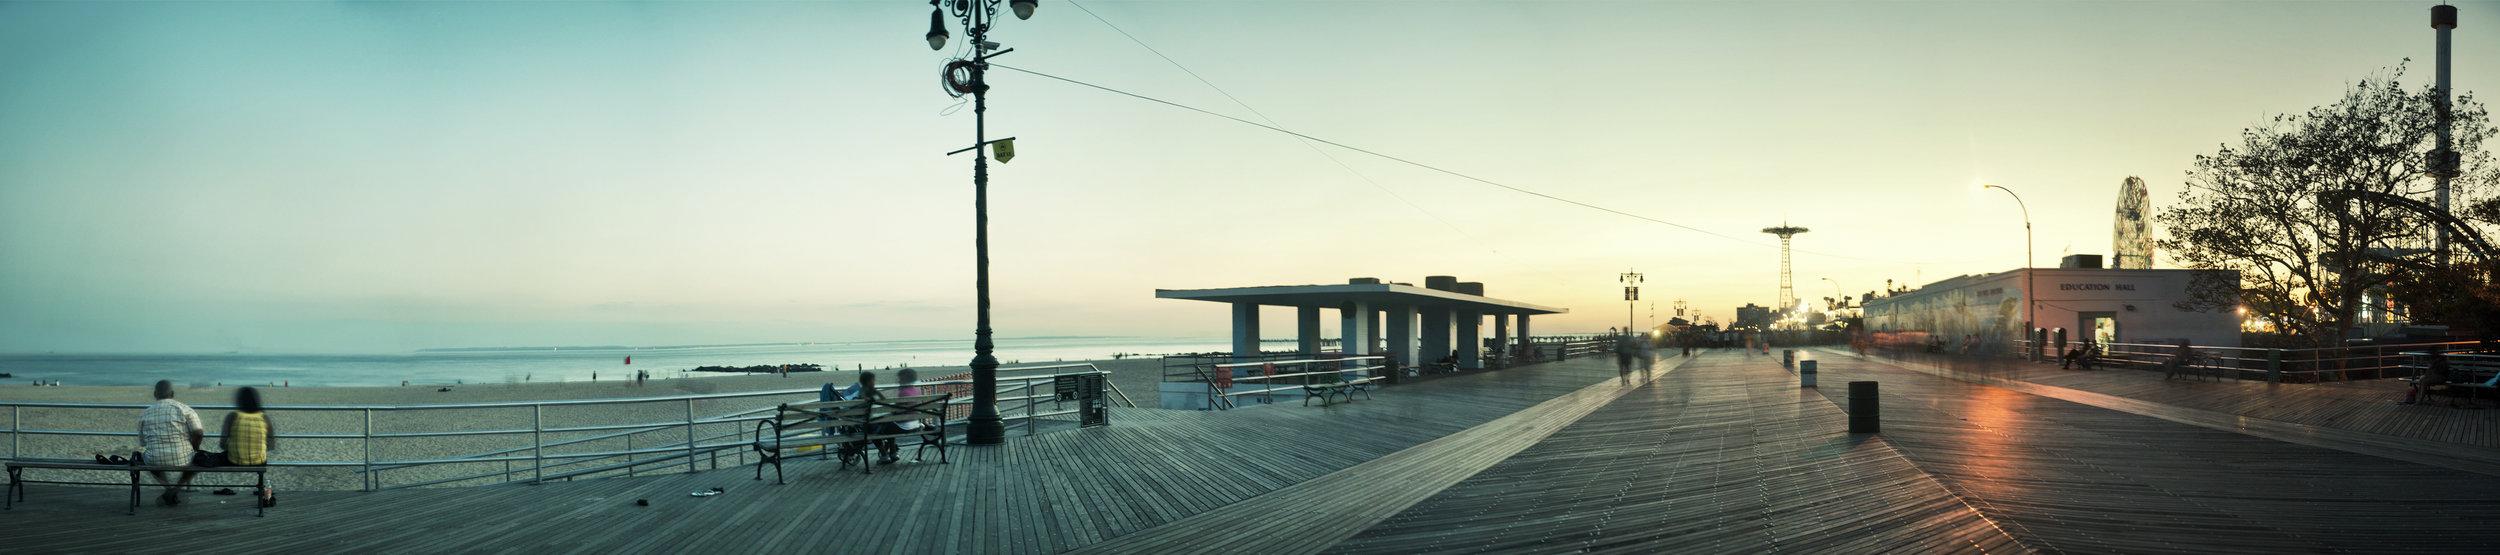 Coney Island-9.jpg